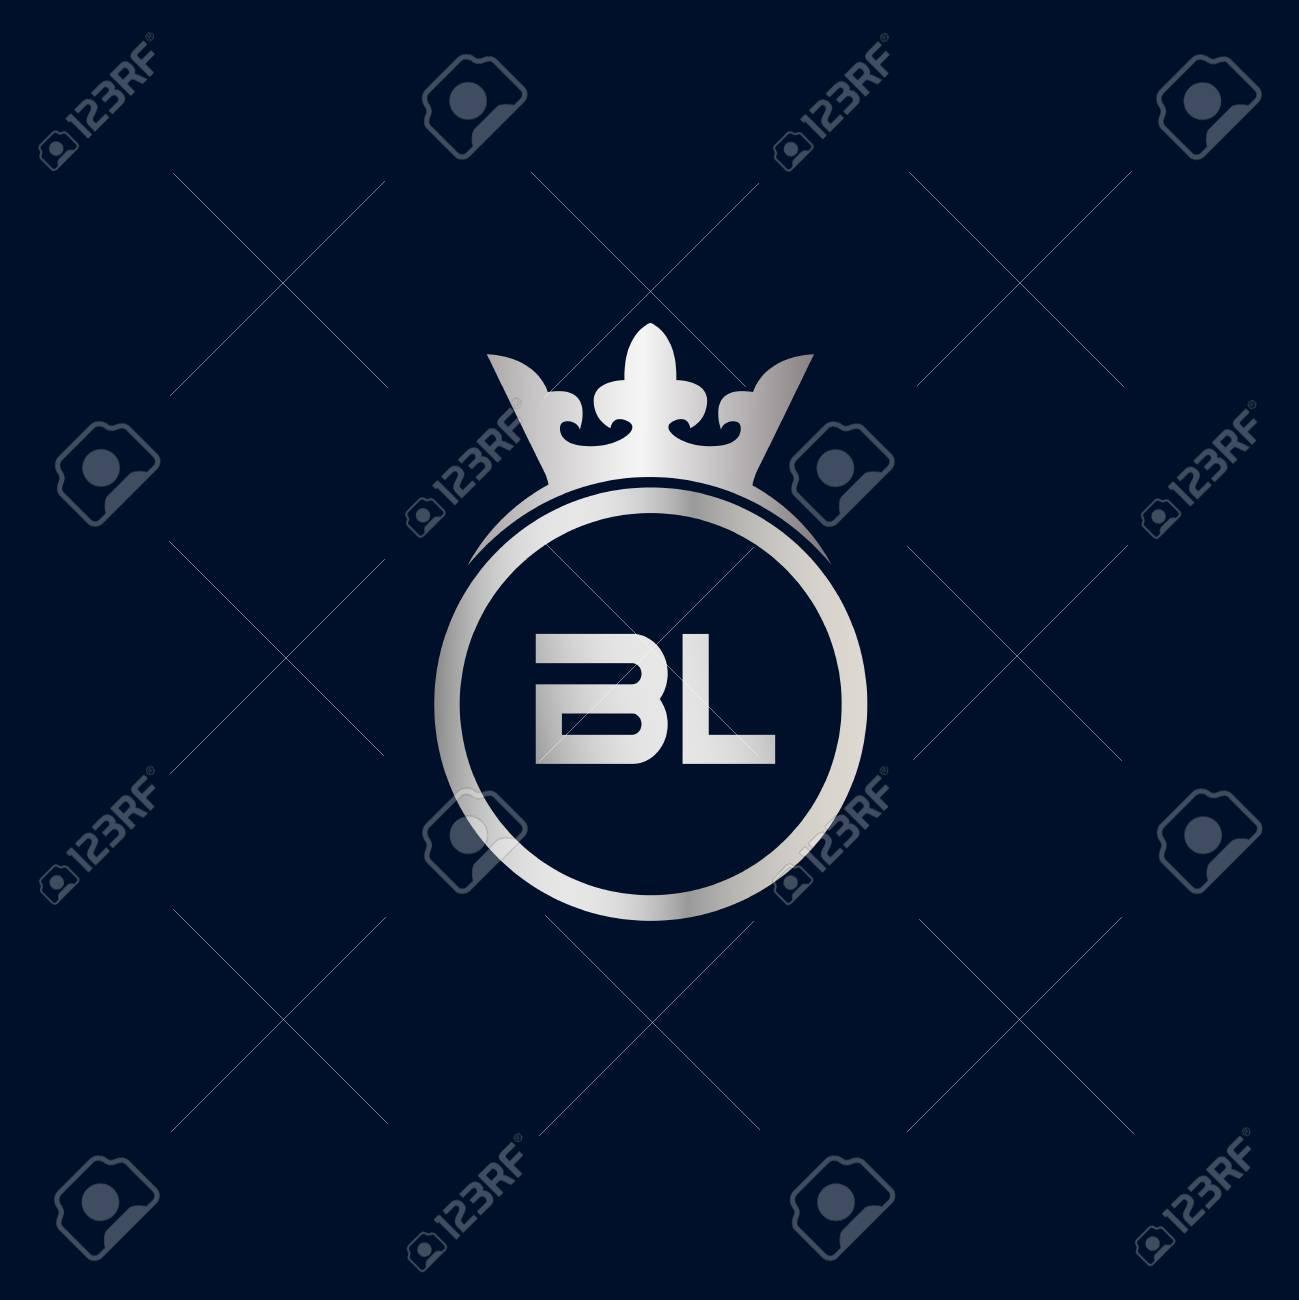 Initial Letter BL Logo Template Design - 108032970